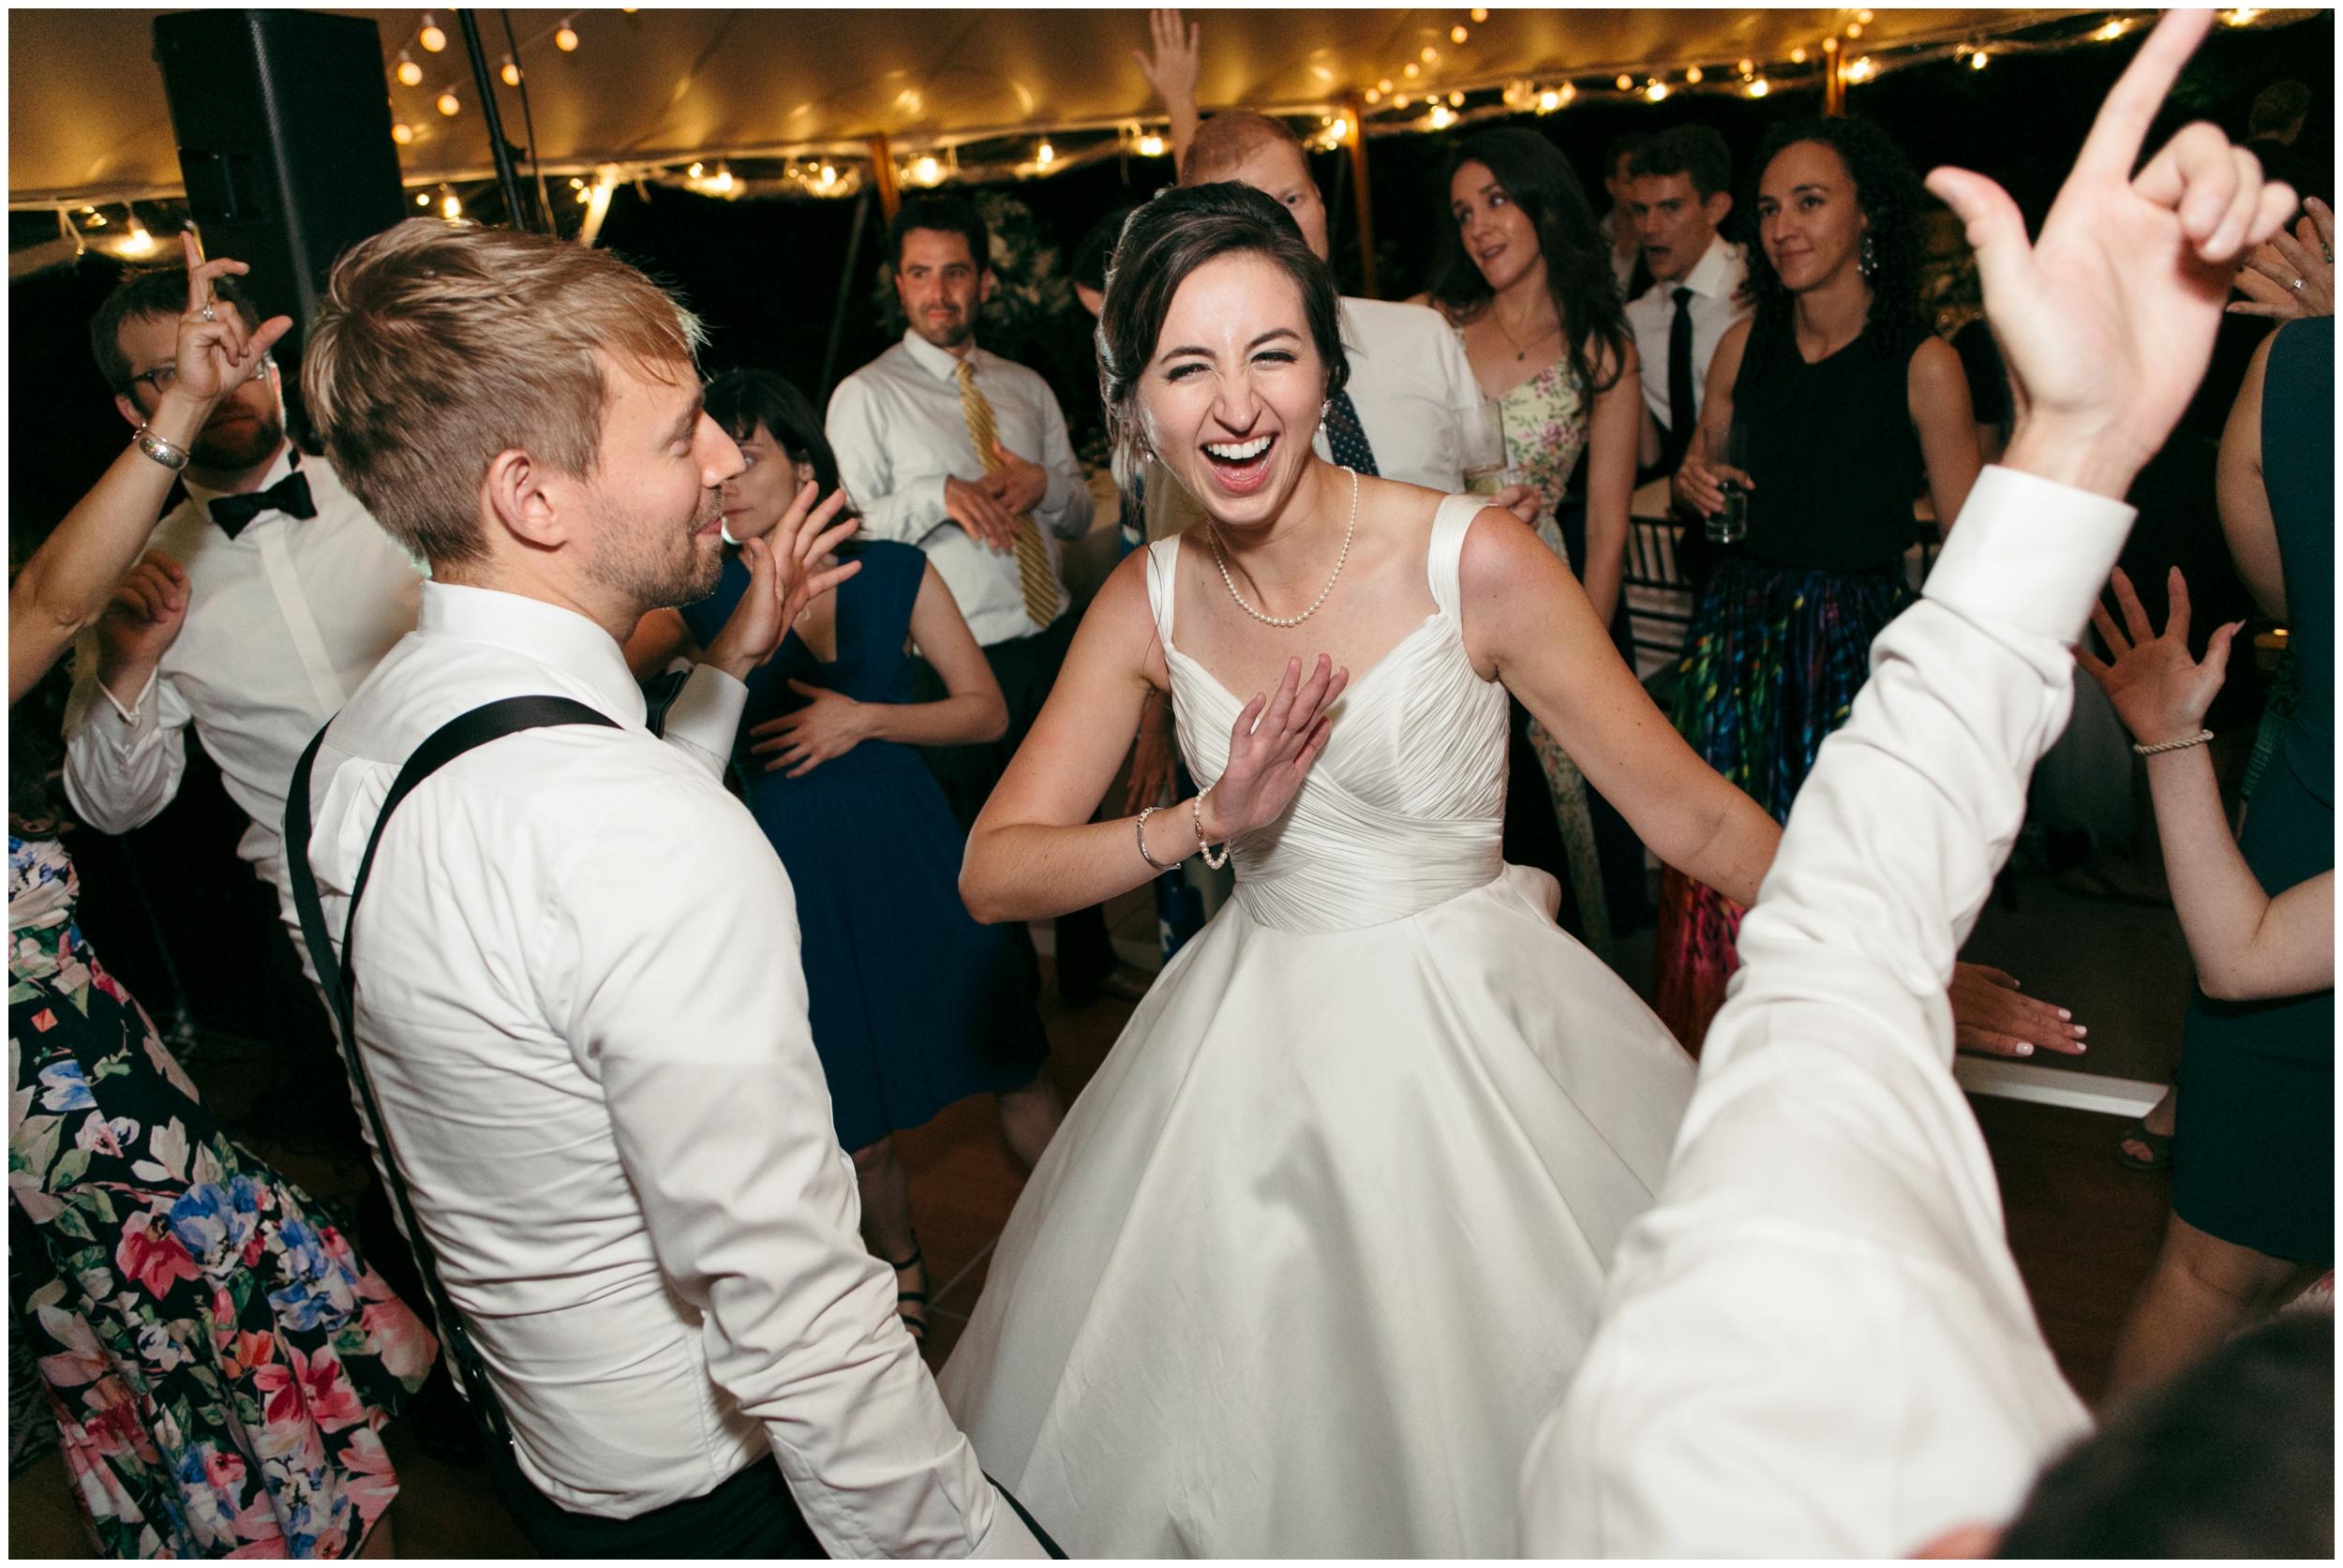 Willowdale-Estate-Wedding-Bailey-Q-Photo-Boston-Wedding-Photographer-115.JPG